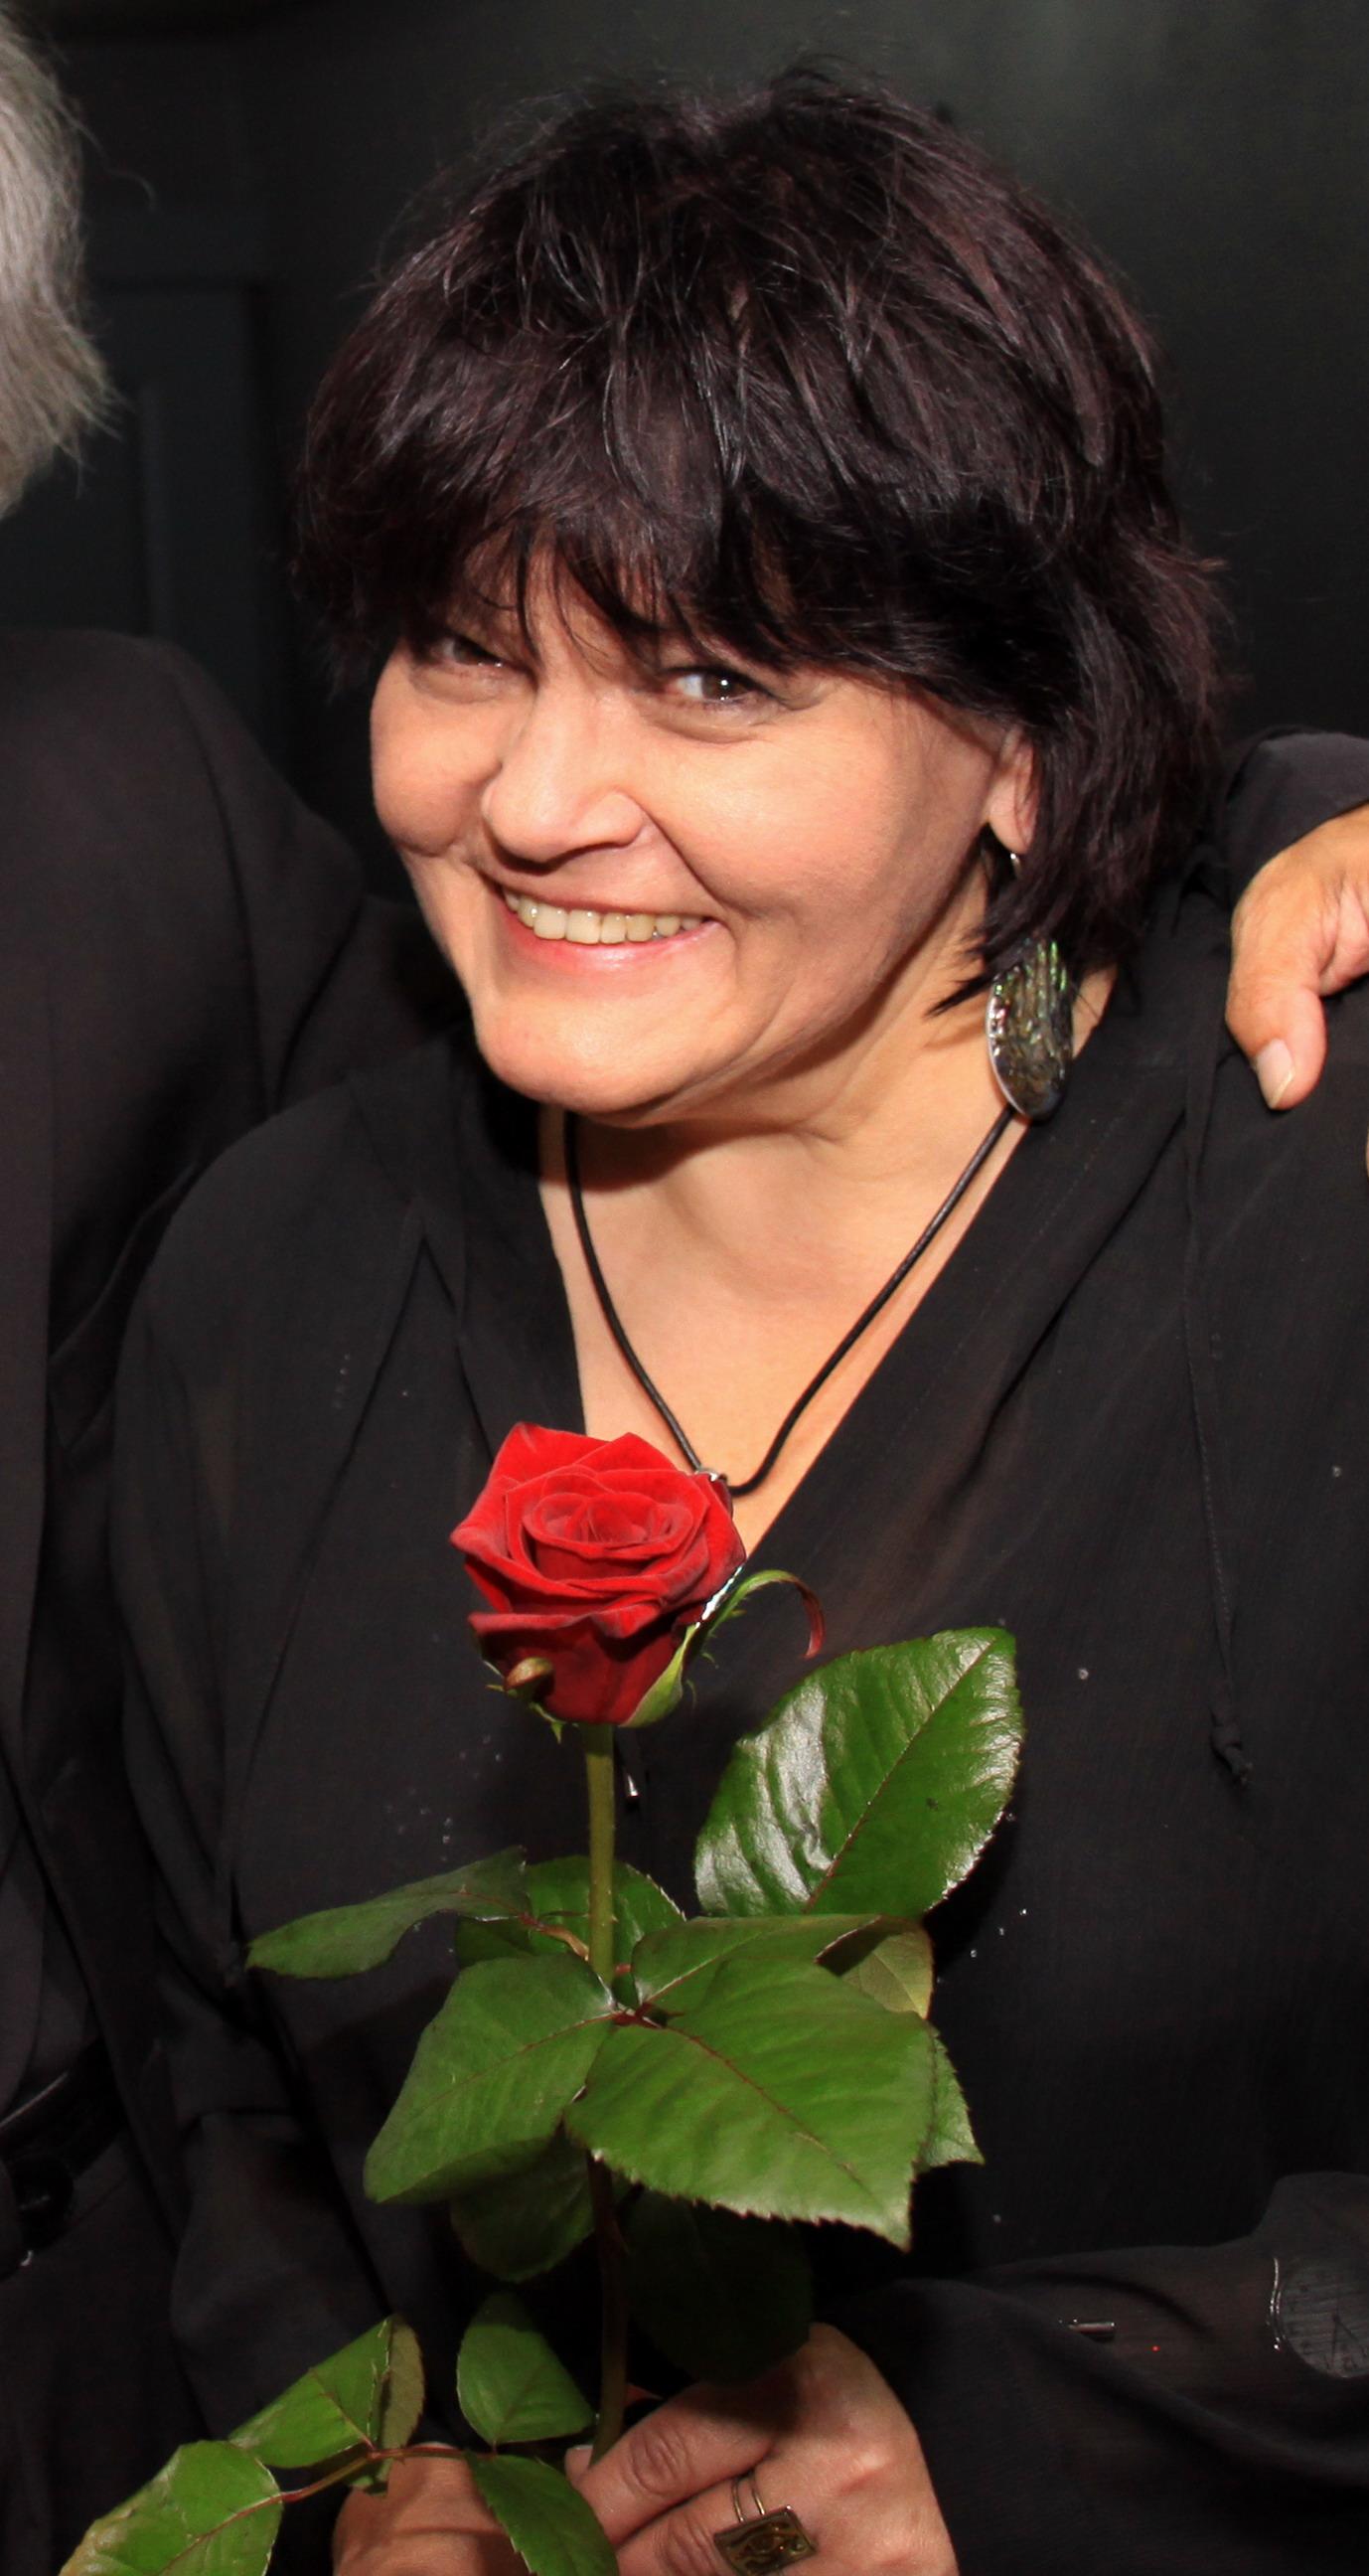 http://upload.wikimedia.org/wikipedia/commons/f/ff/JKruk_20120525_ELZBIETA_ADAMIAK_BUSKO_IMG_0478.jpg